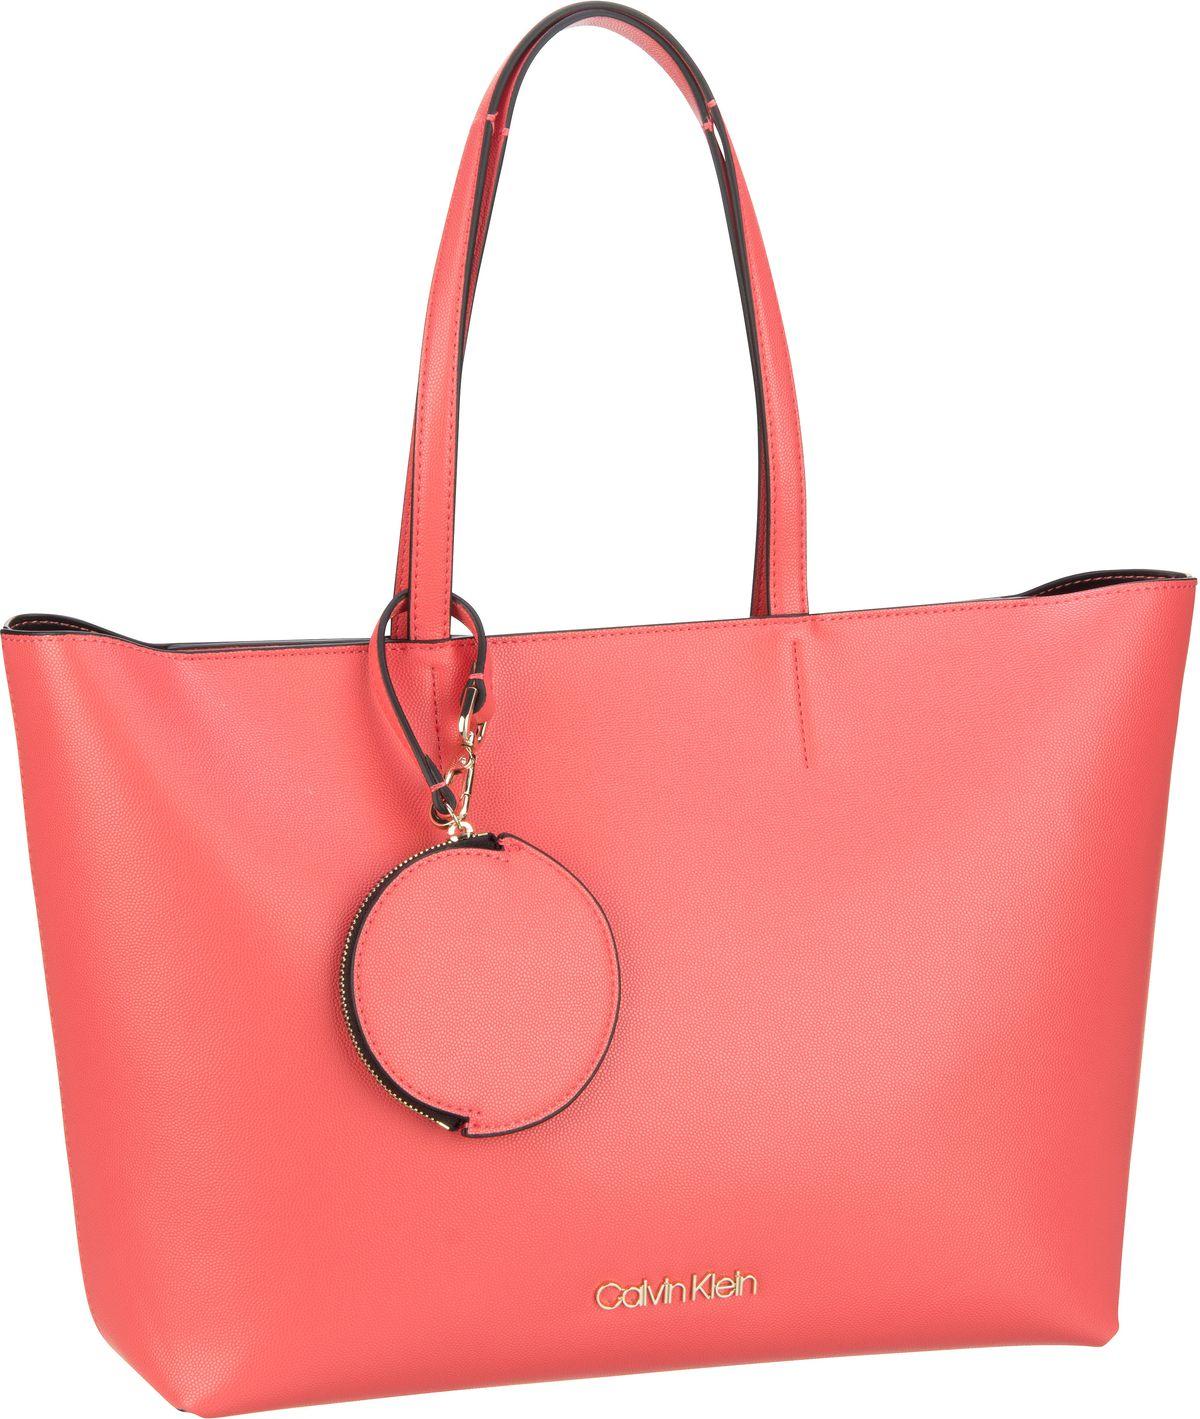 calvin klein -  Handtasche CK Must Shopper MD SP20 Coral